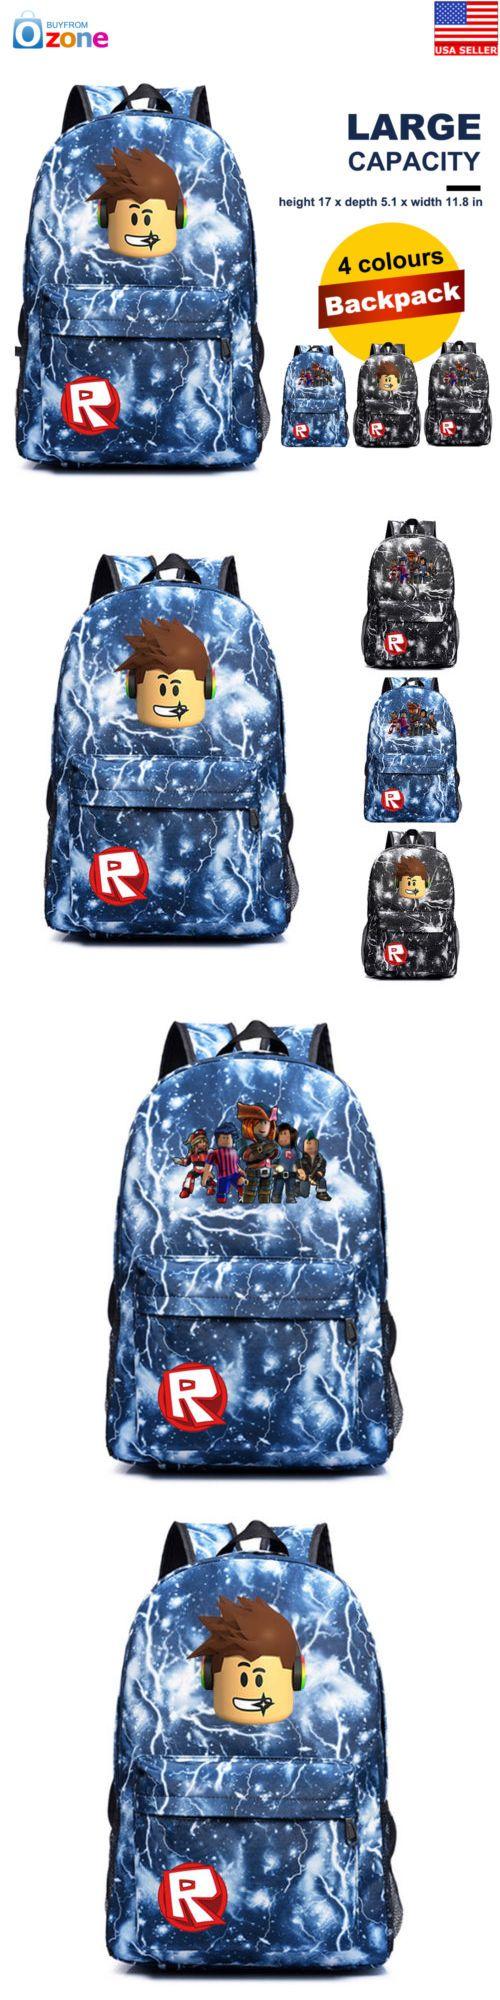 4bf30330742 Backpacks and Bags 57882  Roblox Backpack Kids Schoolbag Students Boys  Gaming Bookbag Travelbag Handbag -  BUY IT NOW ONLY   24.99 on  eBay   backpacks ...